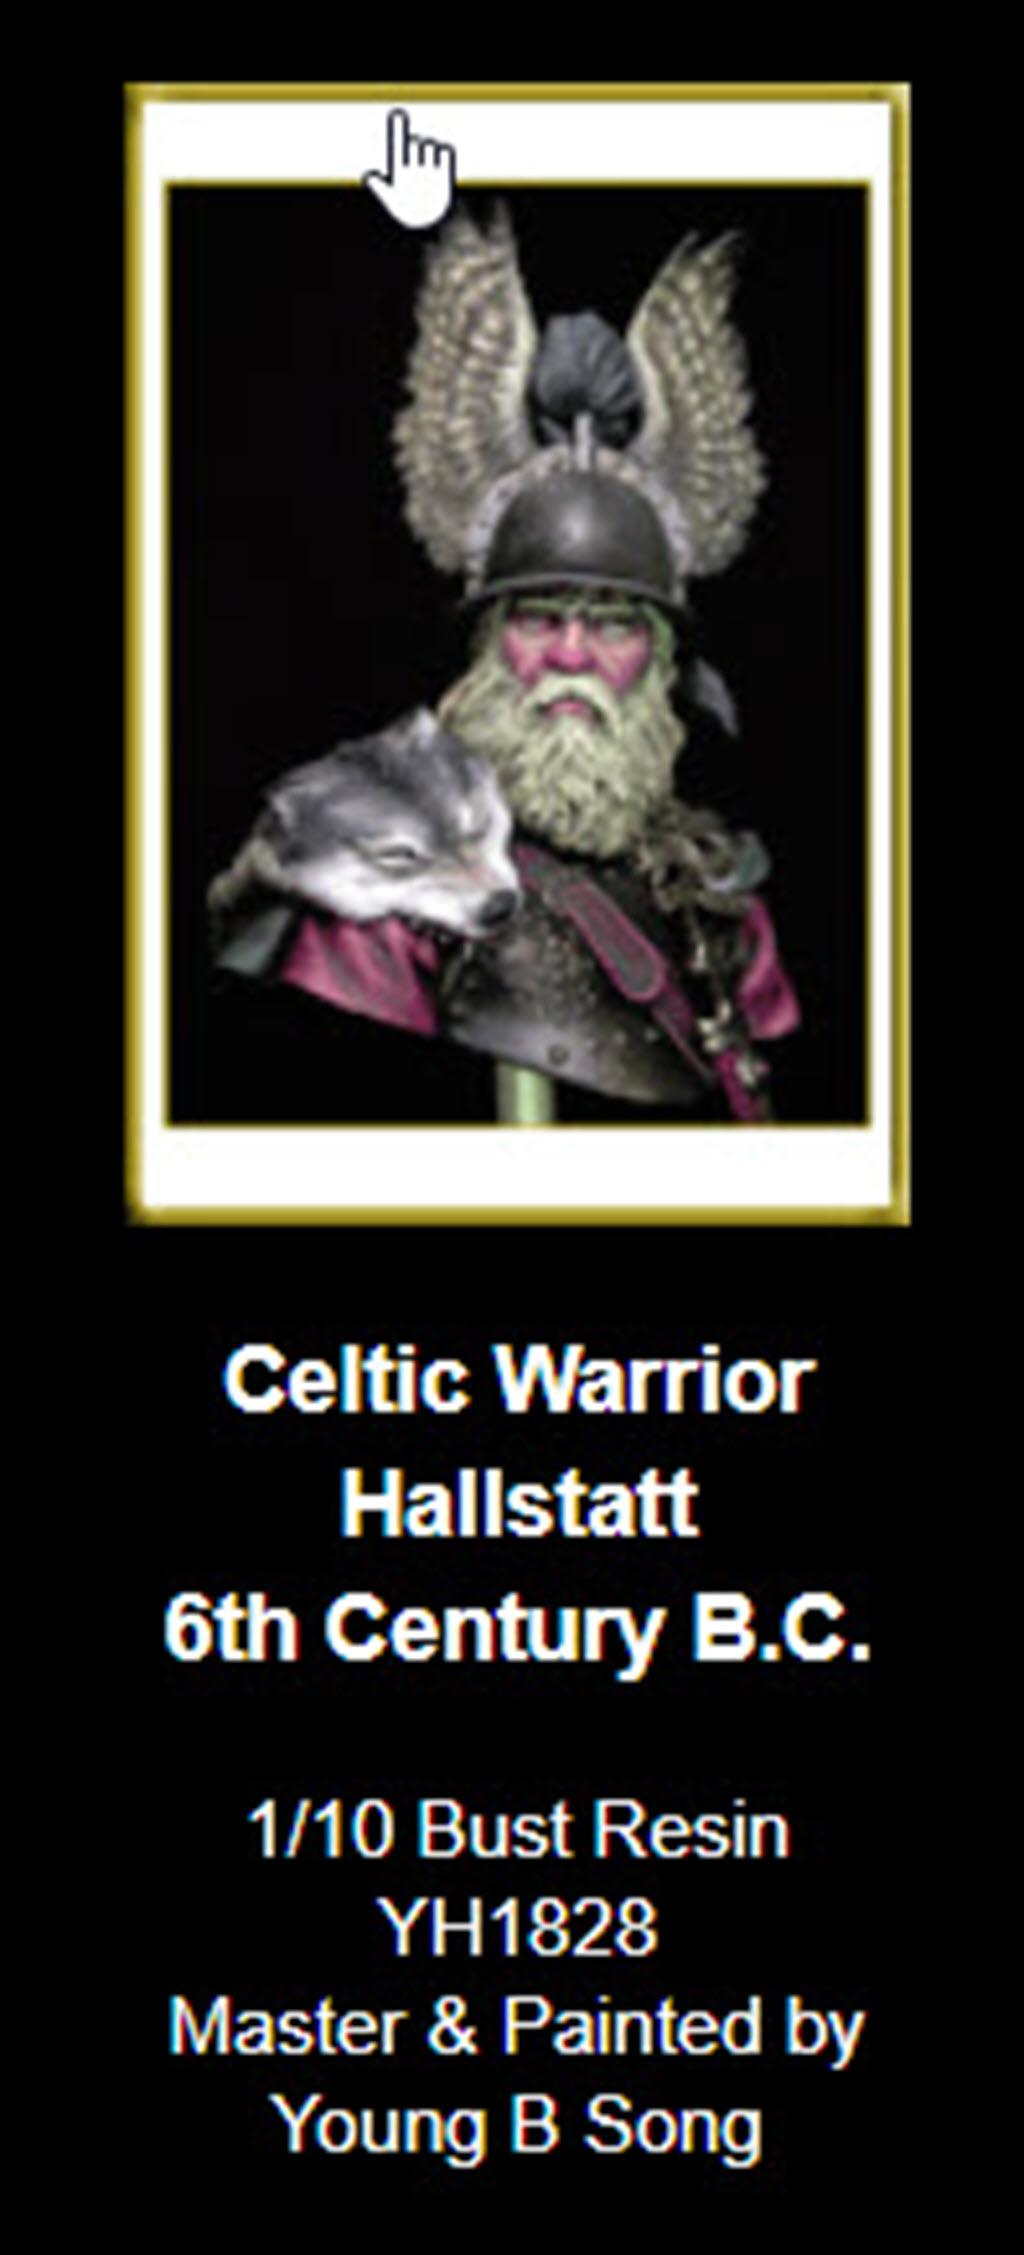 Hallstatt guerrier Celtic 6th B.C. buste Yong miniature 1/10 157